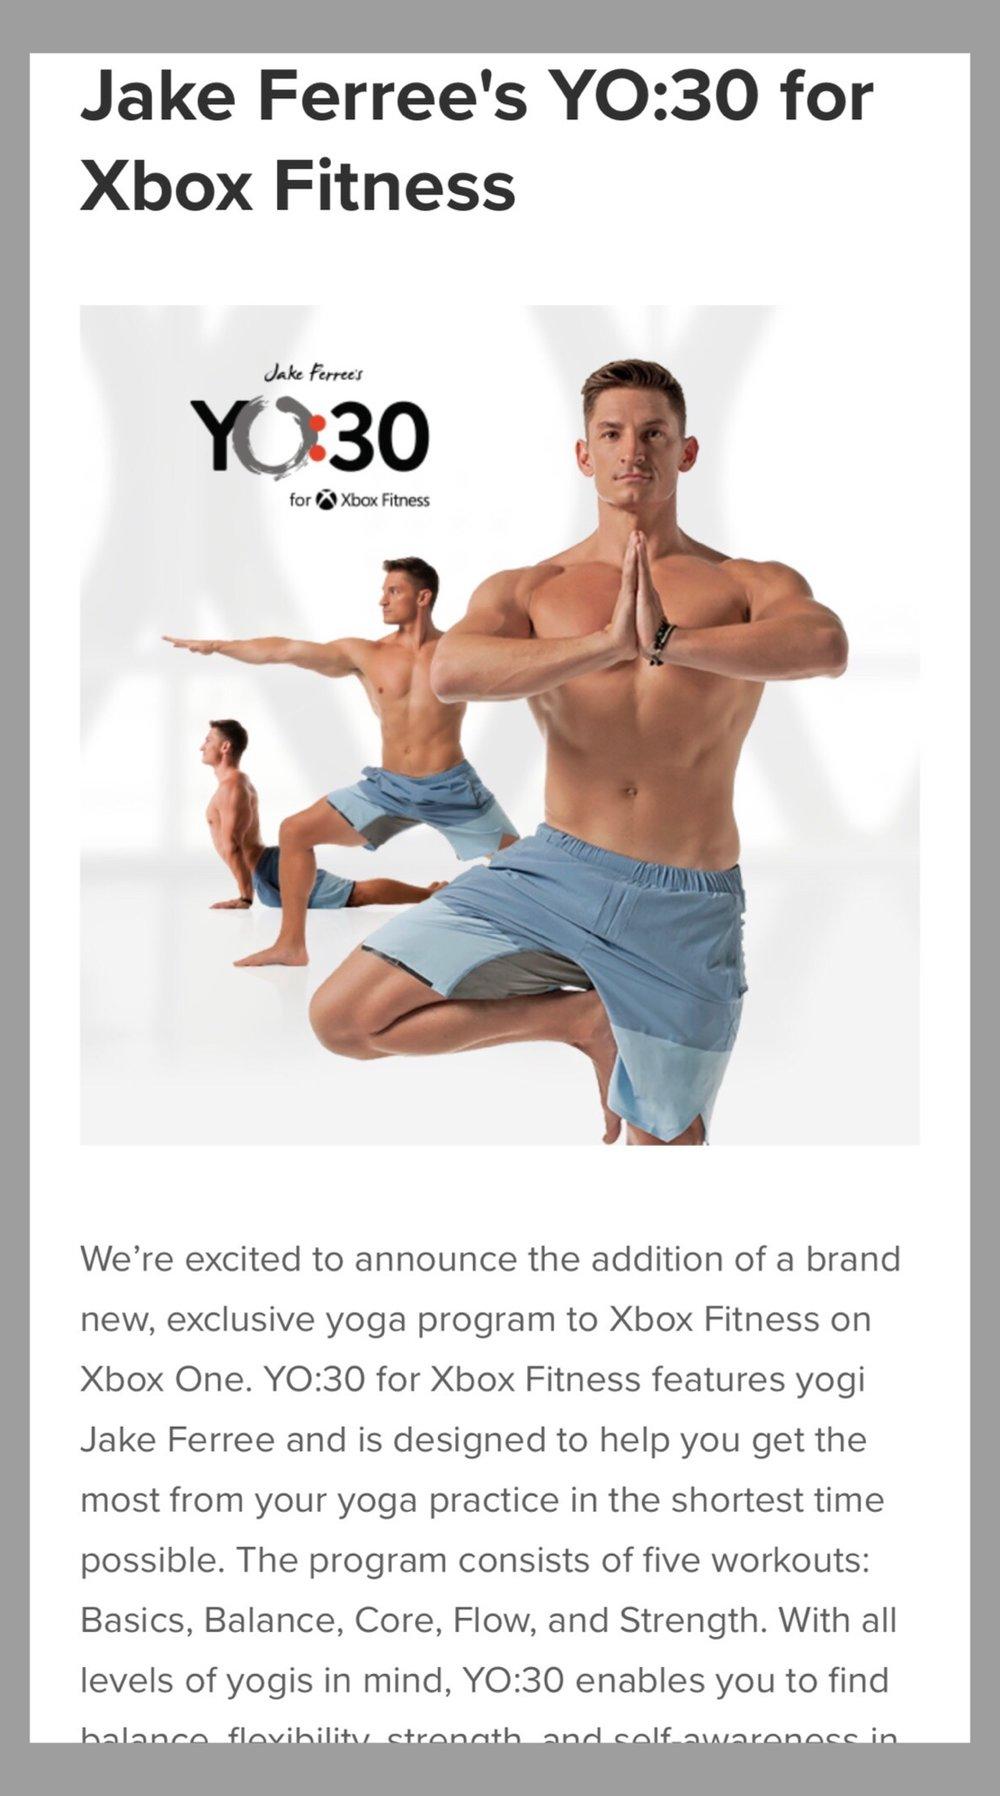 CREATOR OF YO:30 YOGA PROGRAM FOR XBOX FITNESS